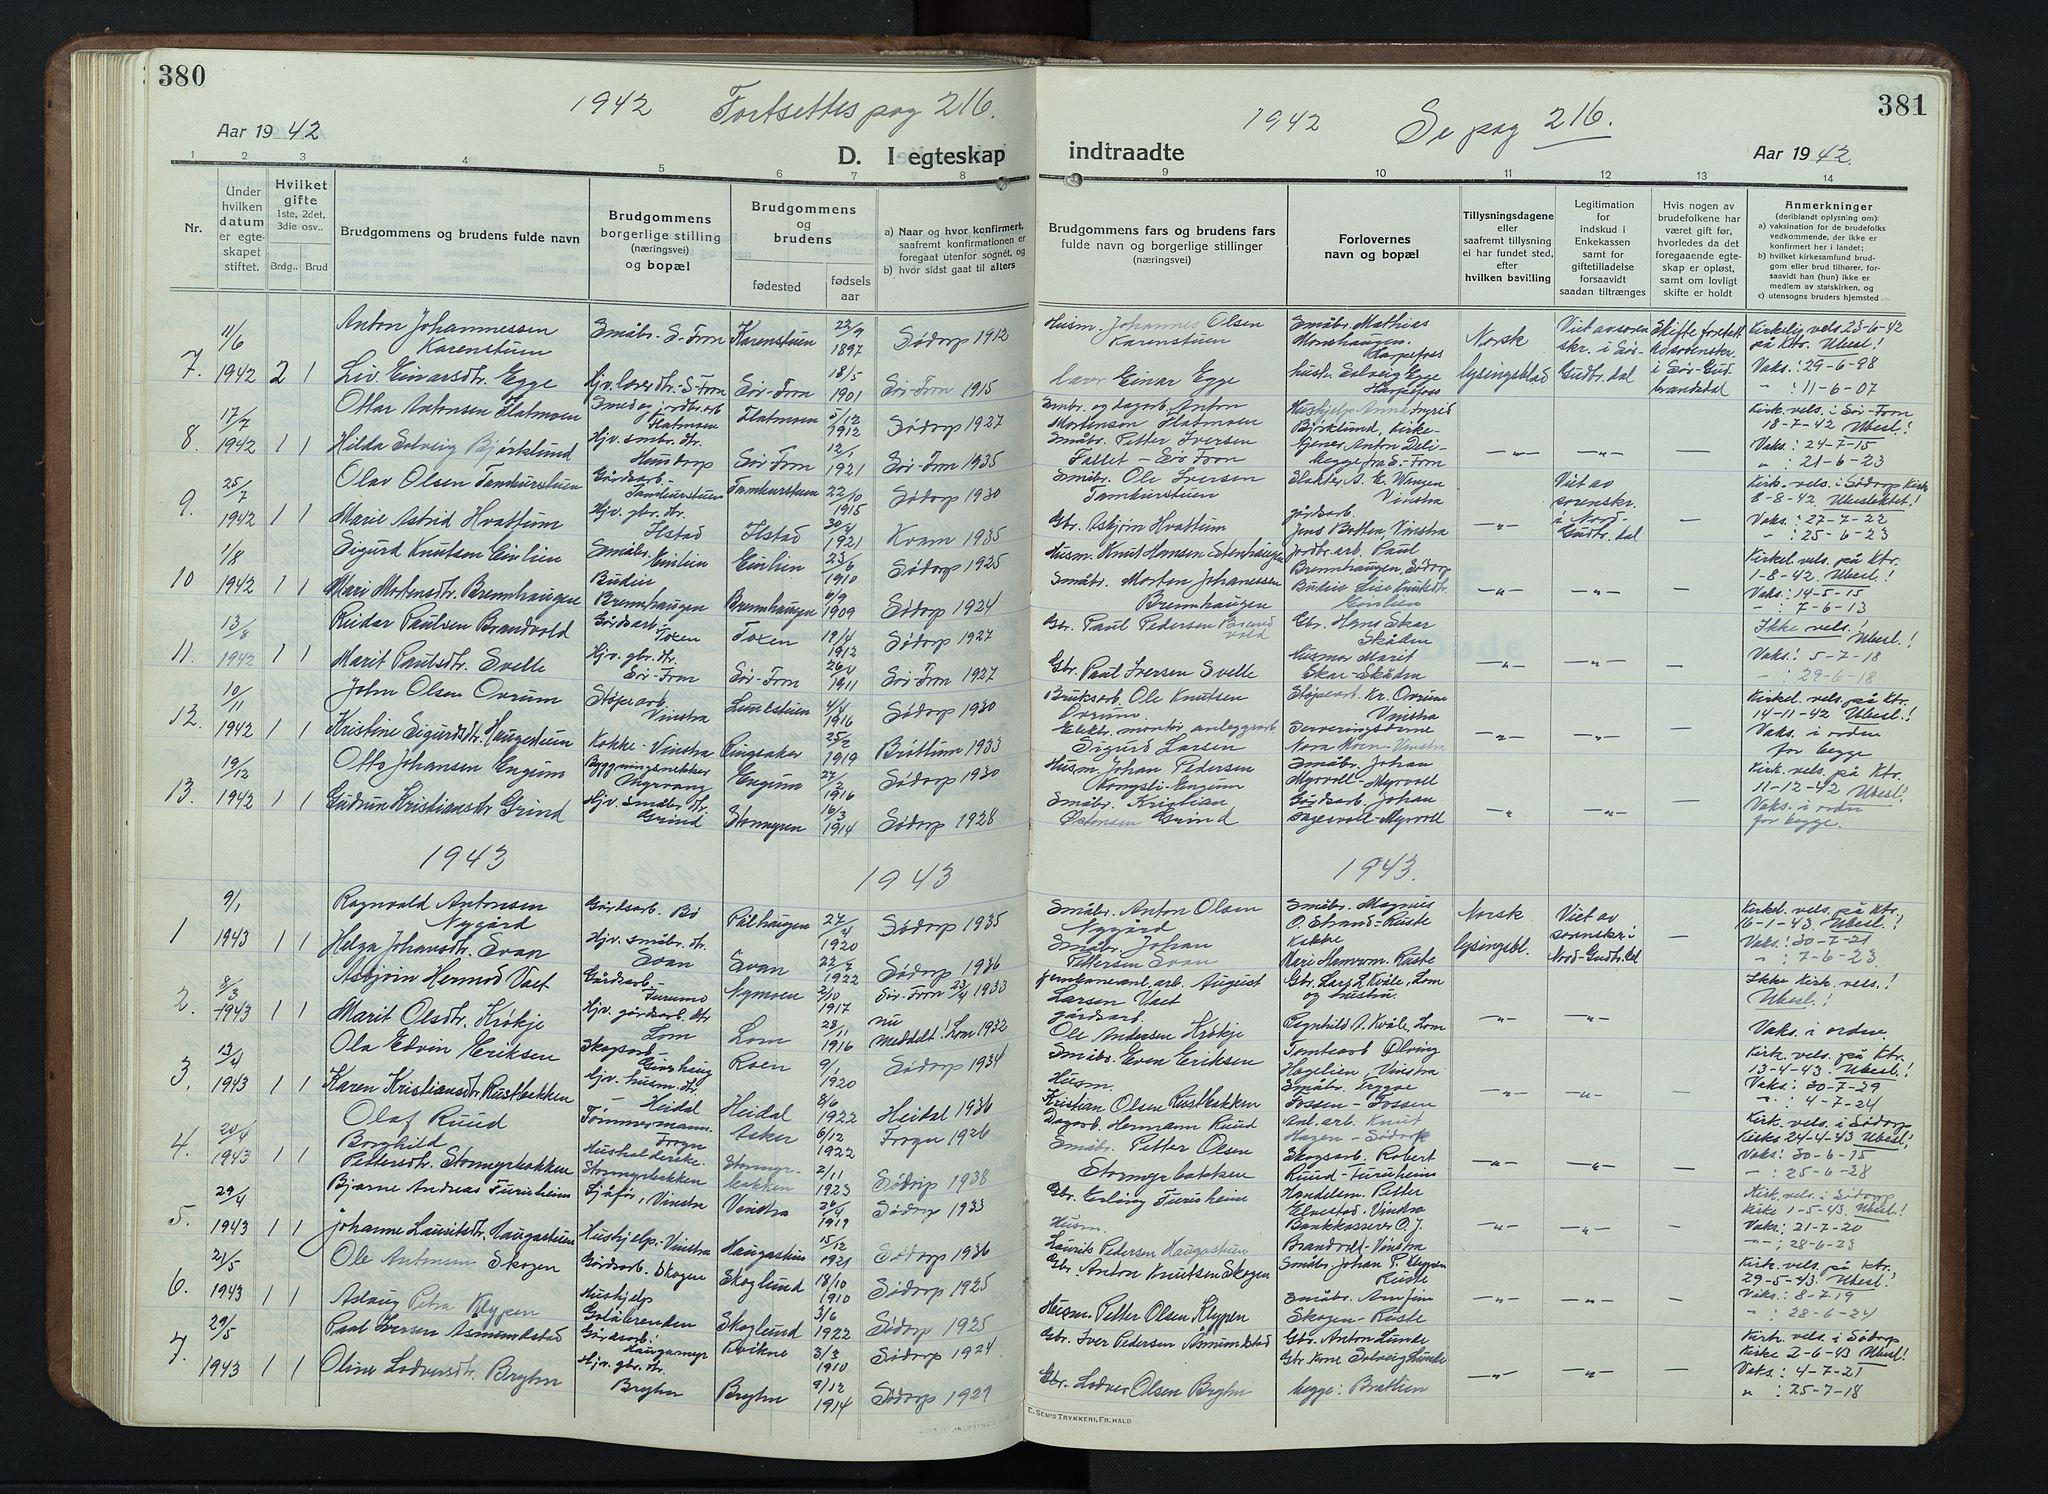 SAH, Nord-Fron prestekontor, Klokkerbok nr. 7, 1915-1946, s. 380-381